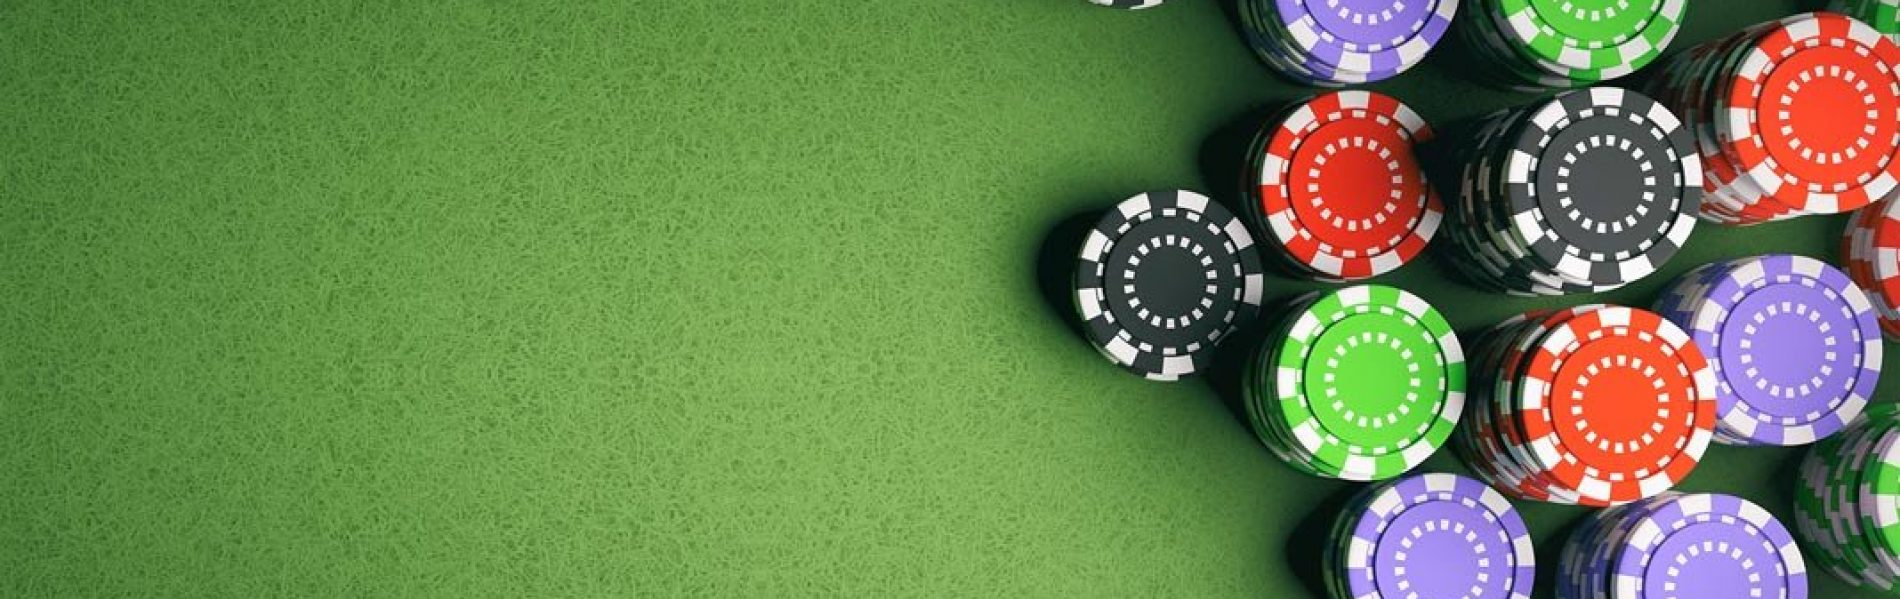 cropped-Casino-poker-chips-on-green-felt-background-artificial-intelligence-shutterstock-658269847-1068×601.jpg